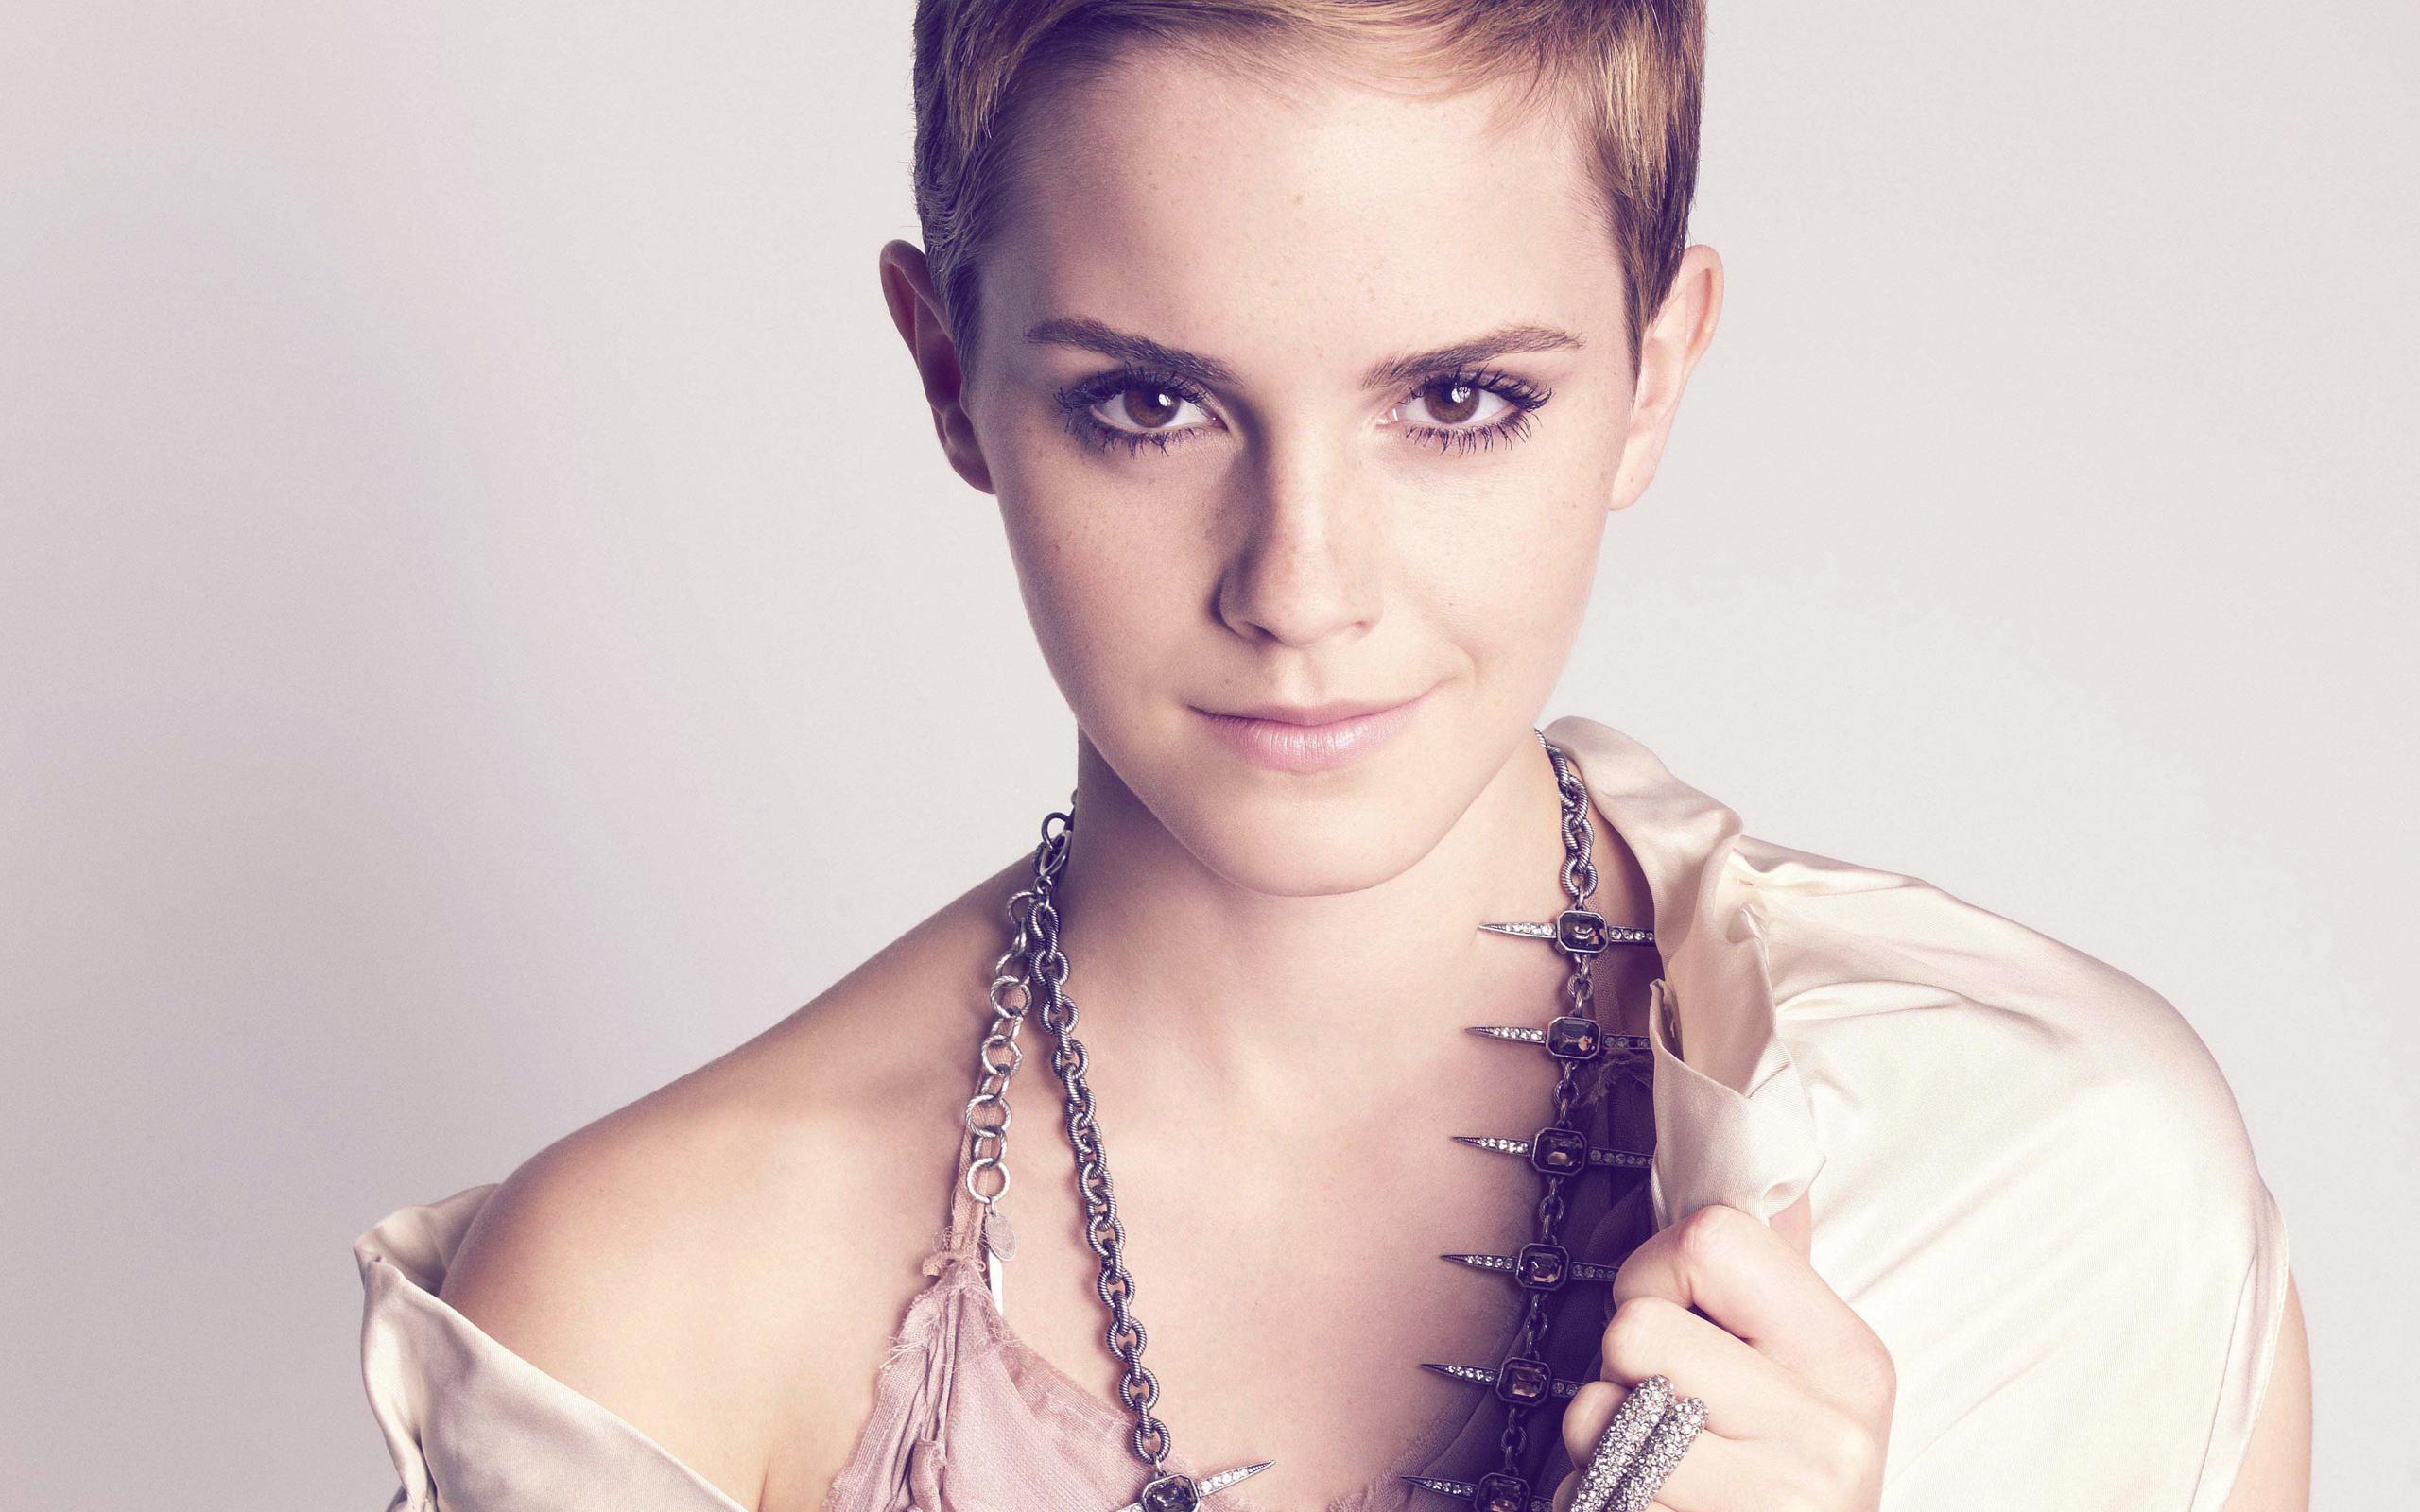 Emma Watson 2012 wallpaper